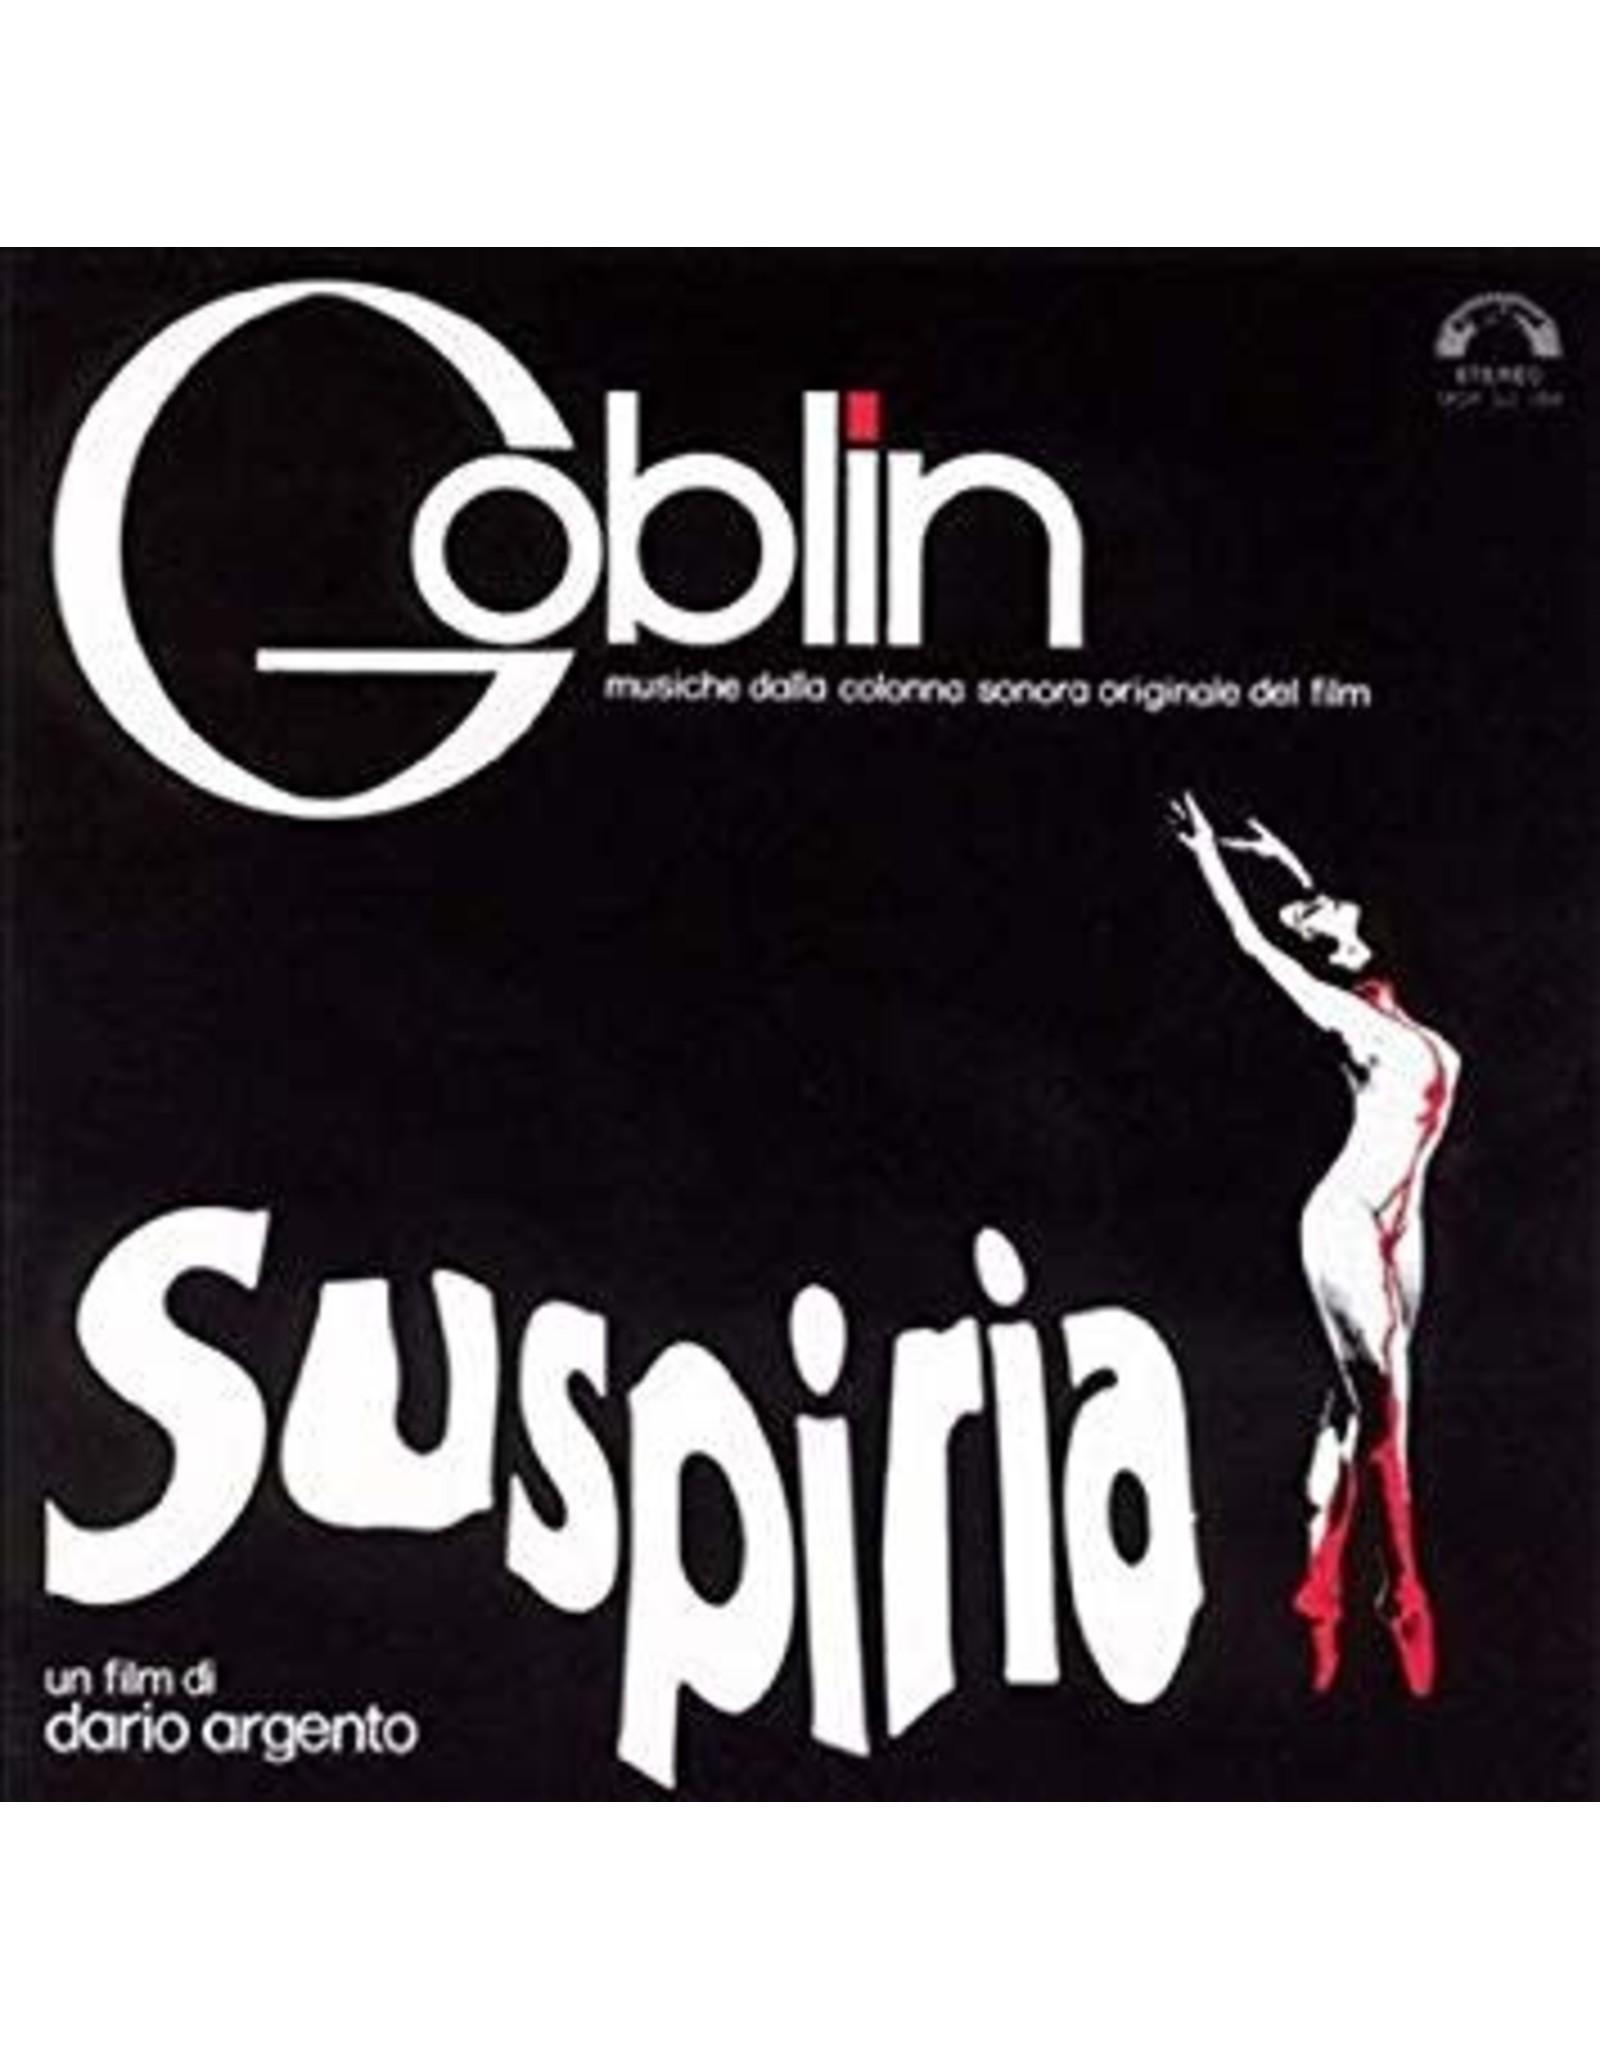 Goblin - Suspiria (Original) [Blue Vinyl]